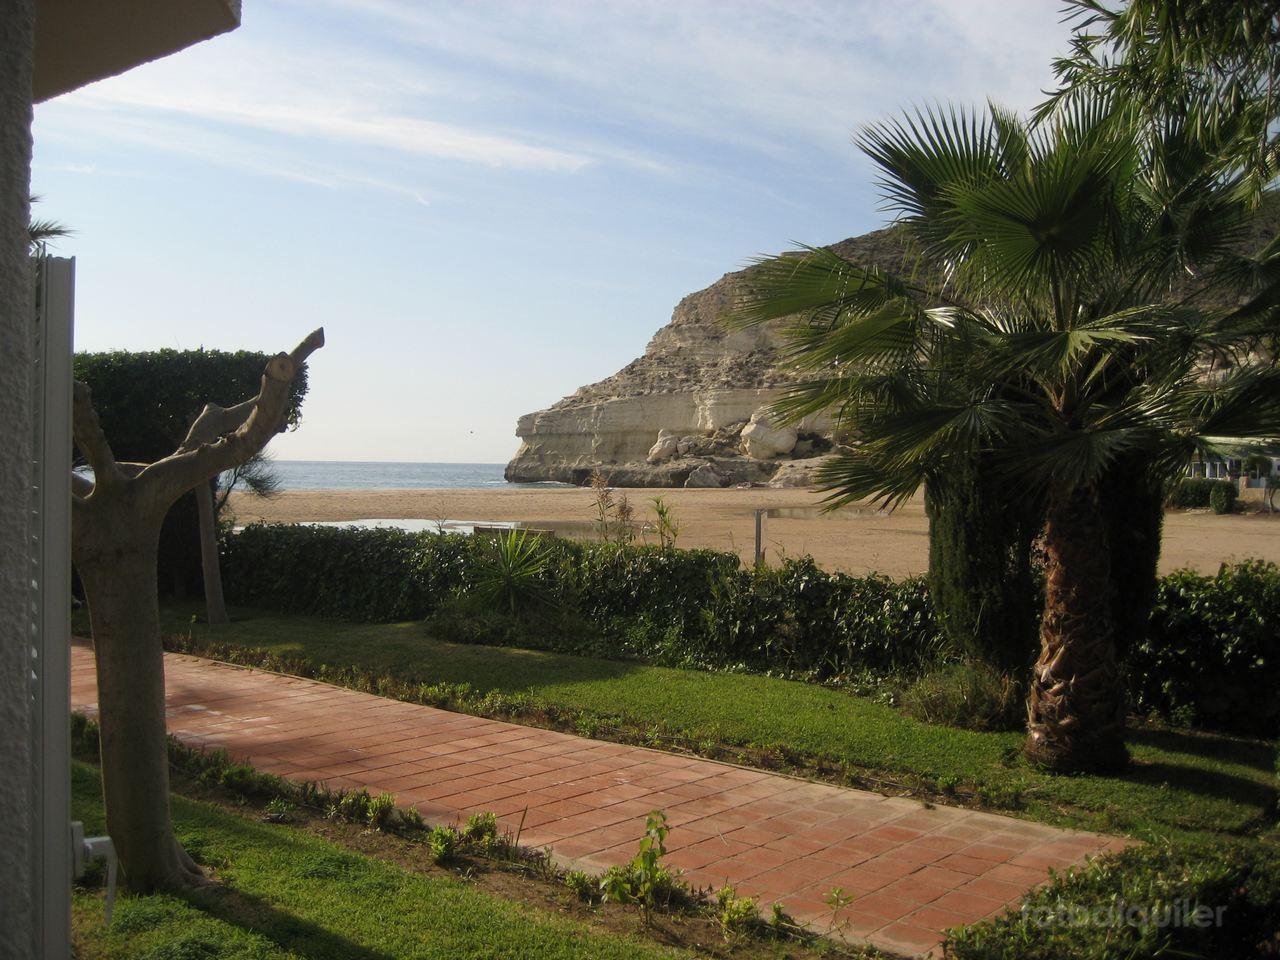 Alquiler apartamento primera línea de playa, Agua Amarga, Almería, ref.: agua-amarga11264